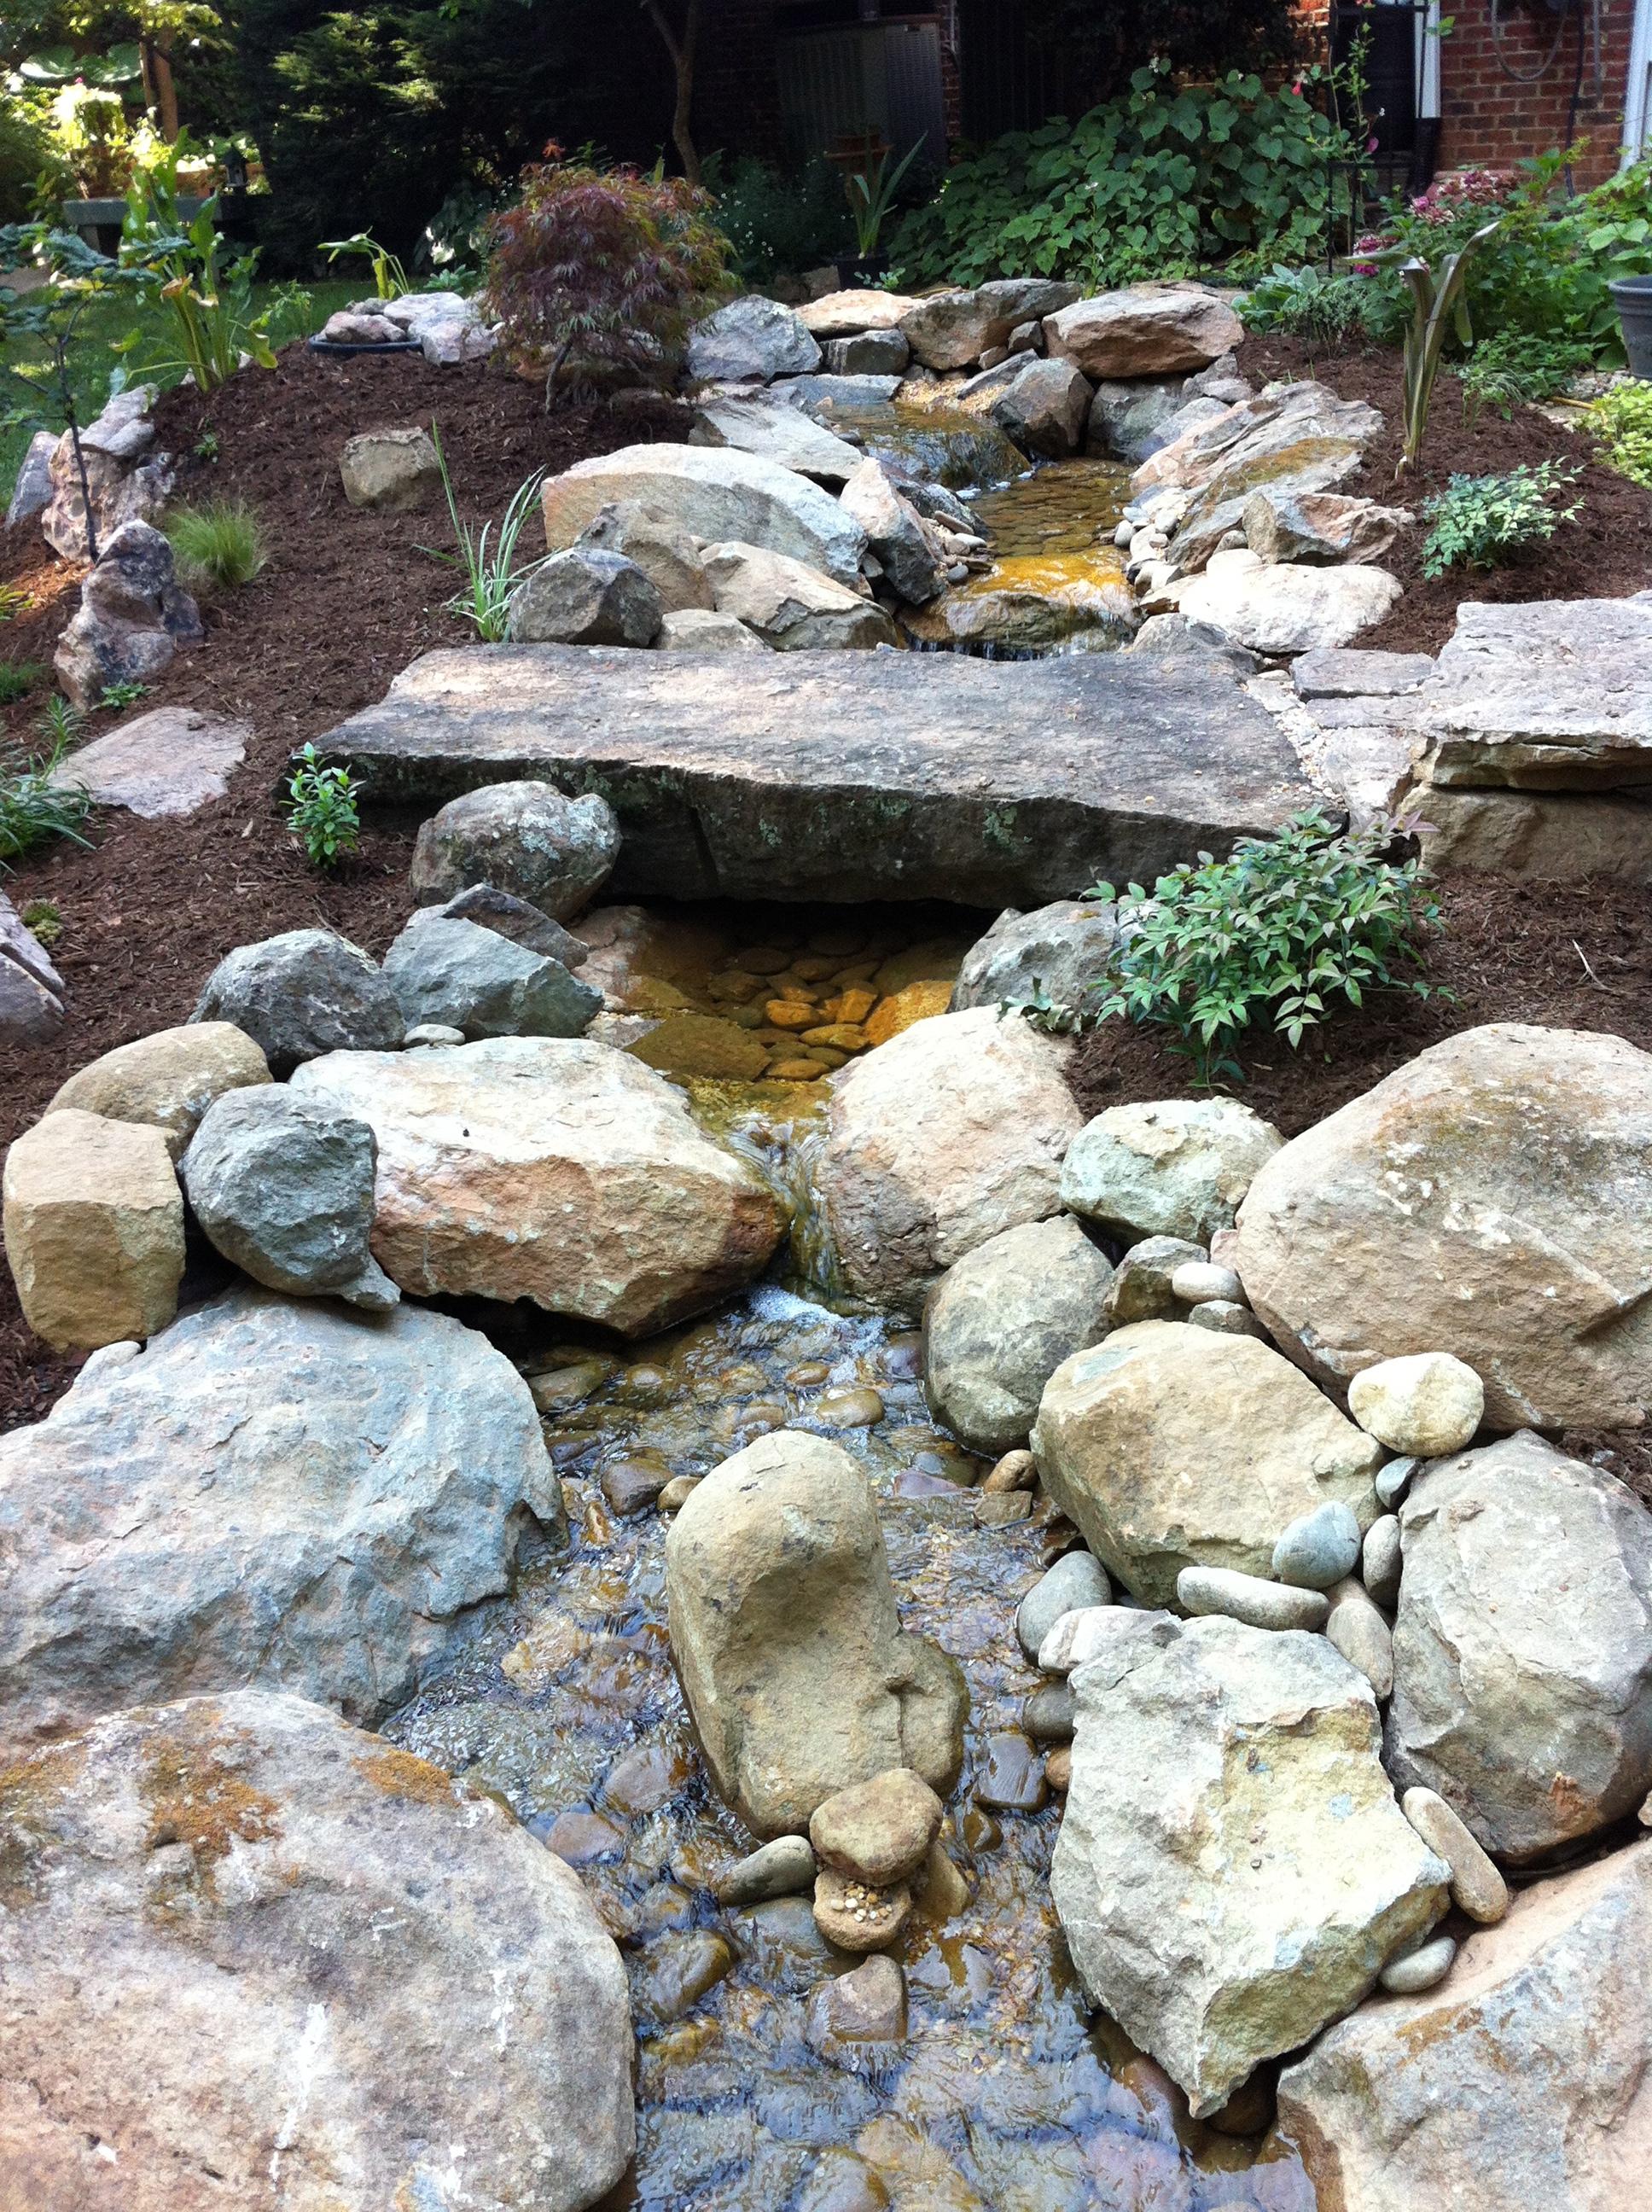 Native NC stones create a natural stream